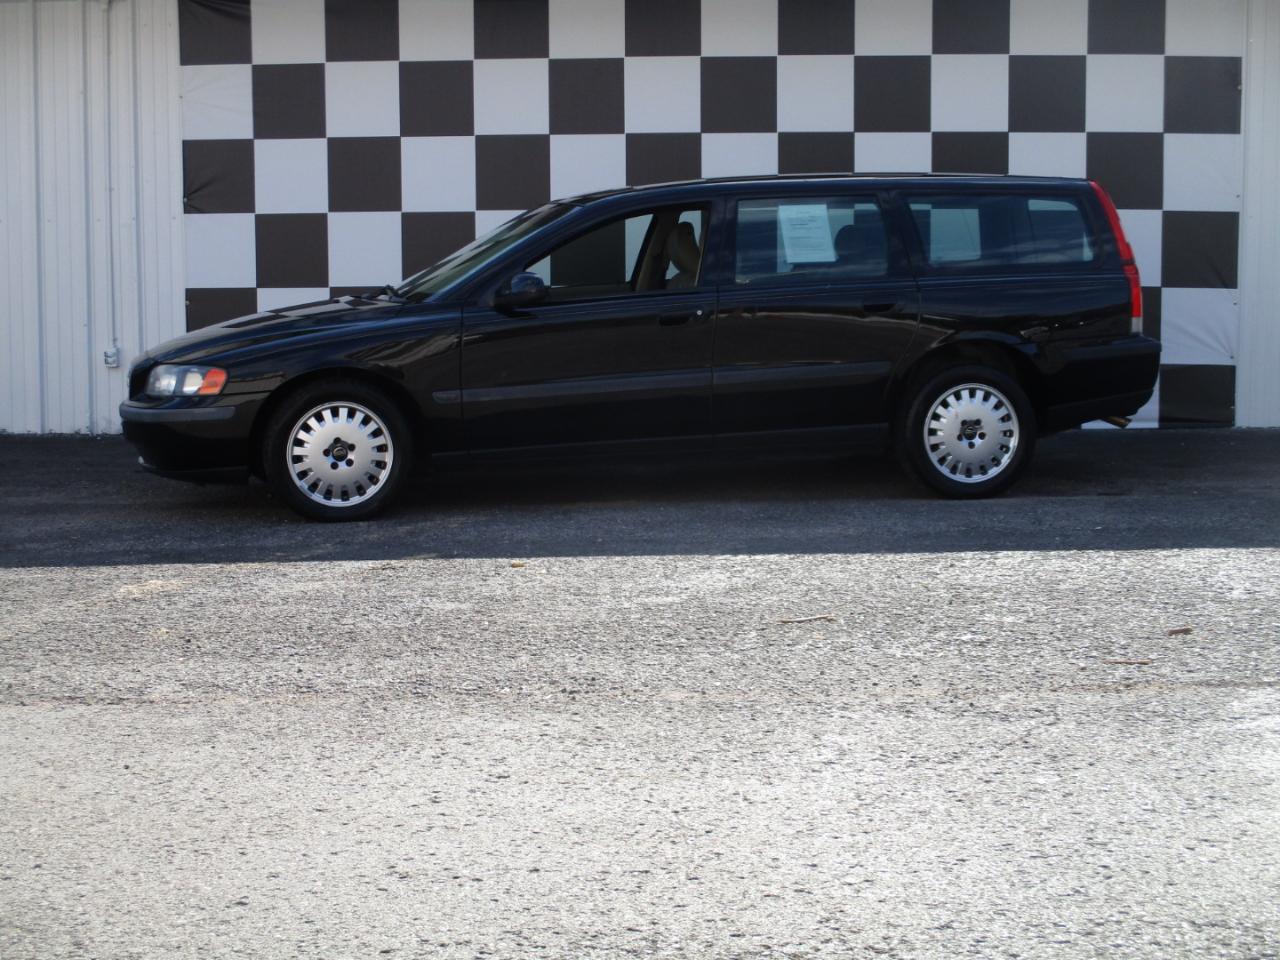 Volvo V70 2.4 M 5dr Wgn 2001